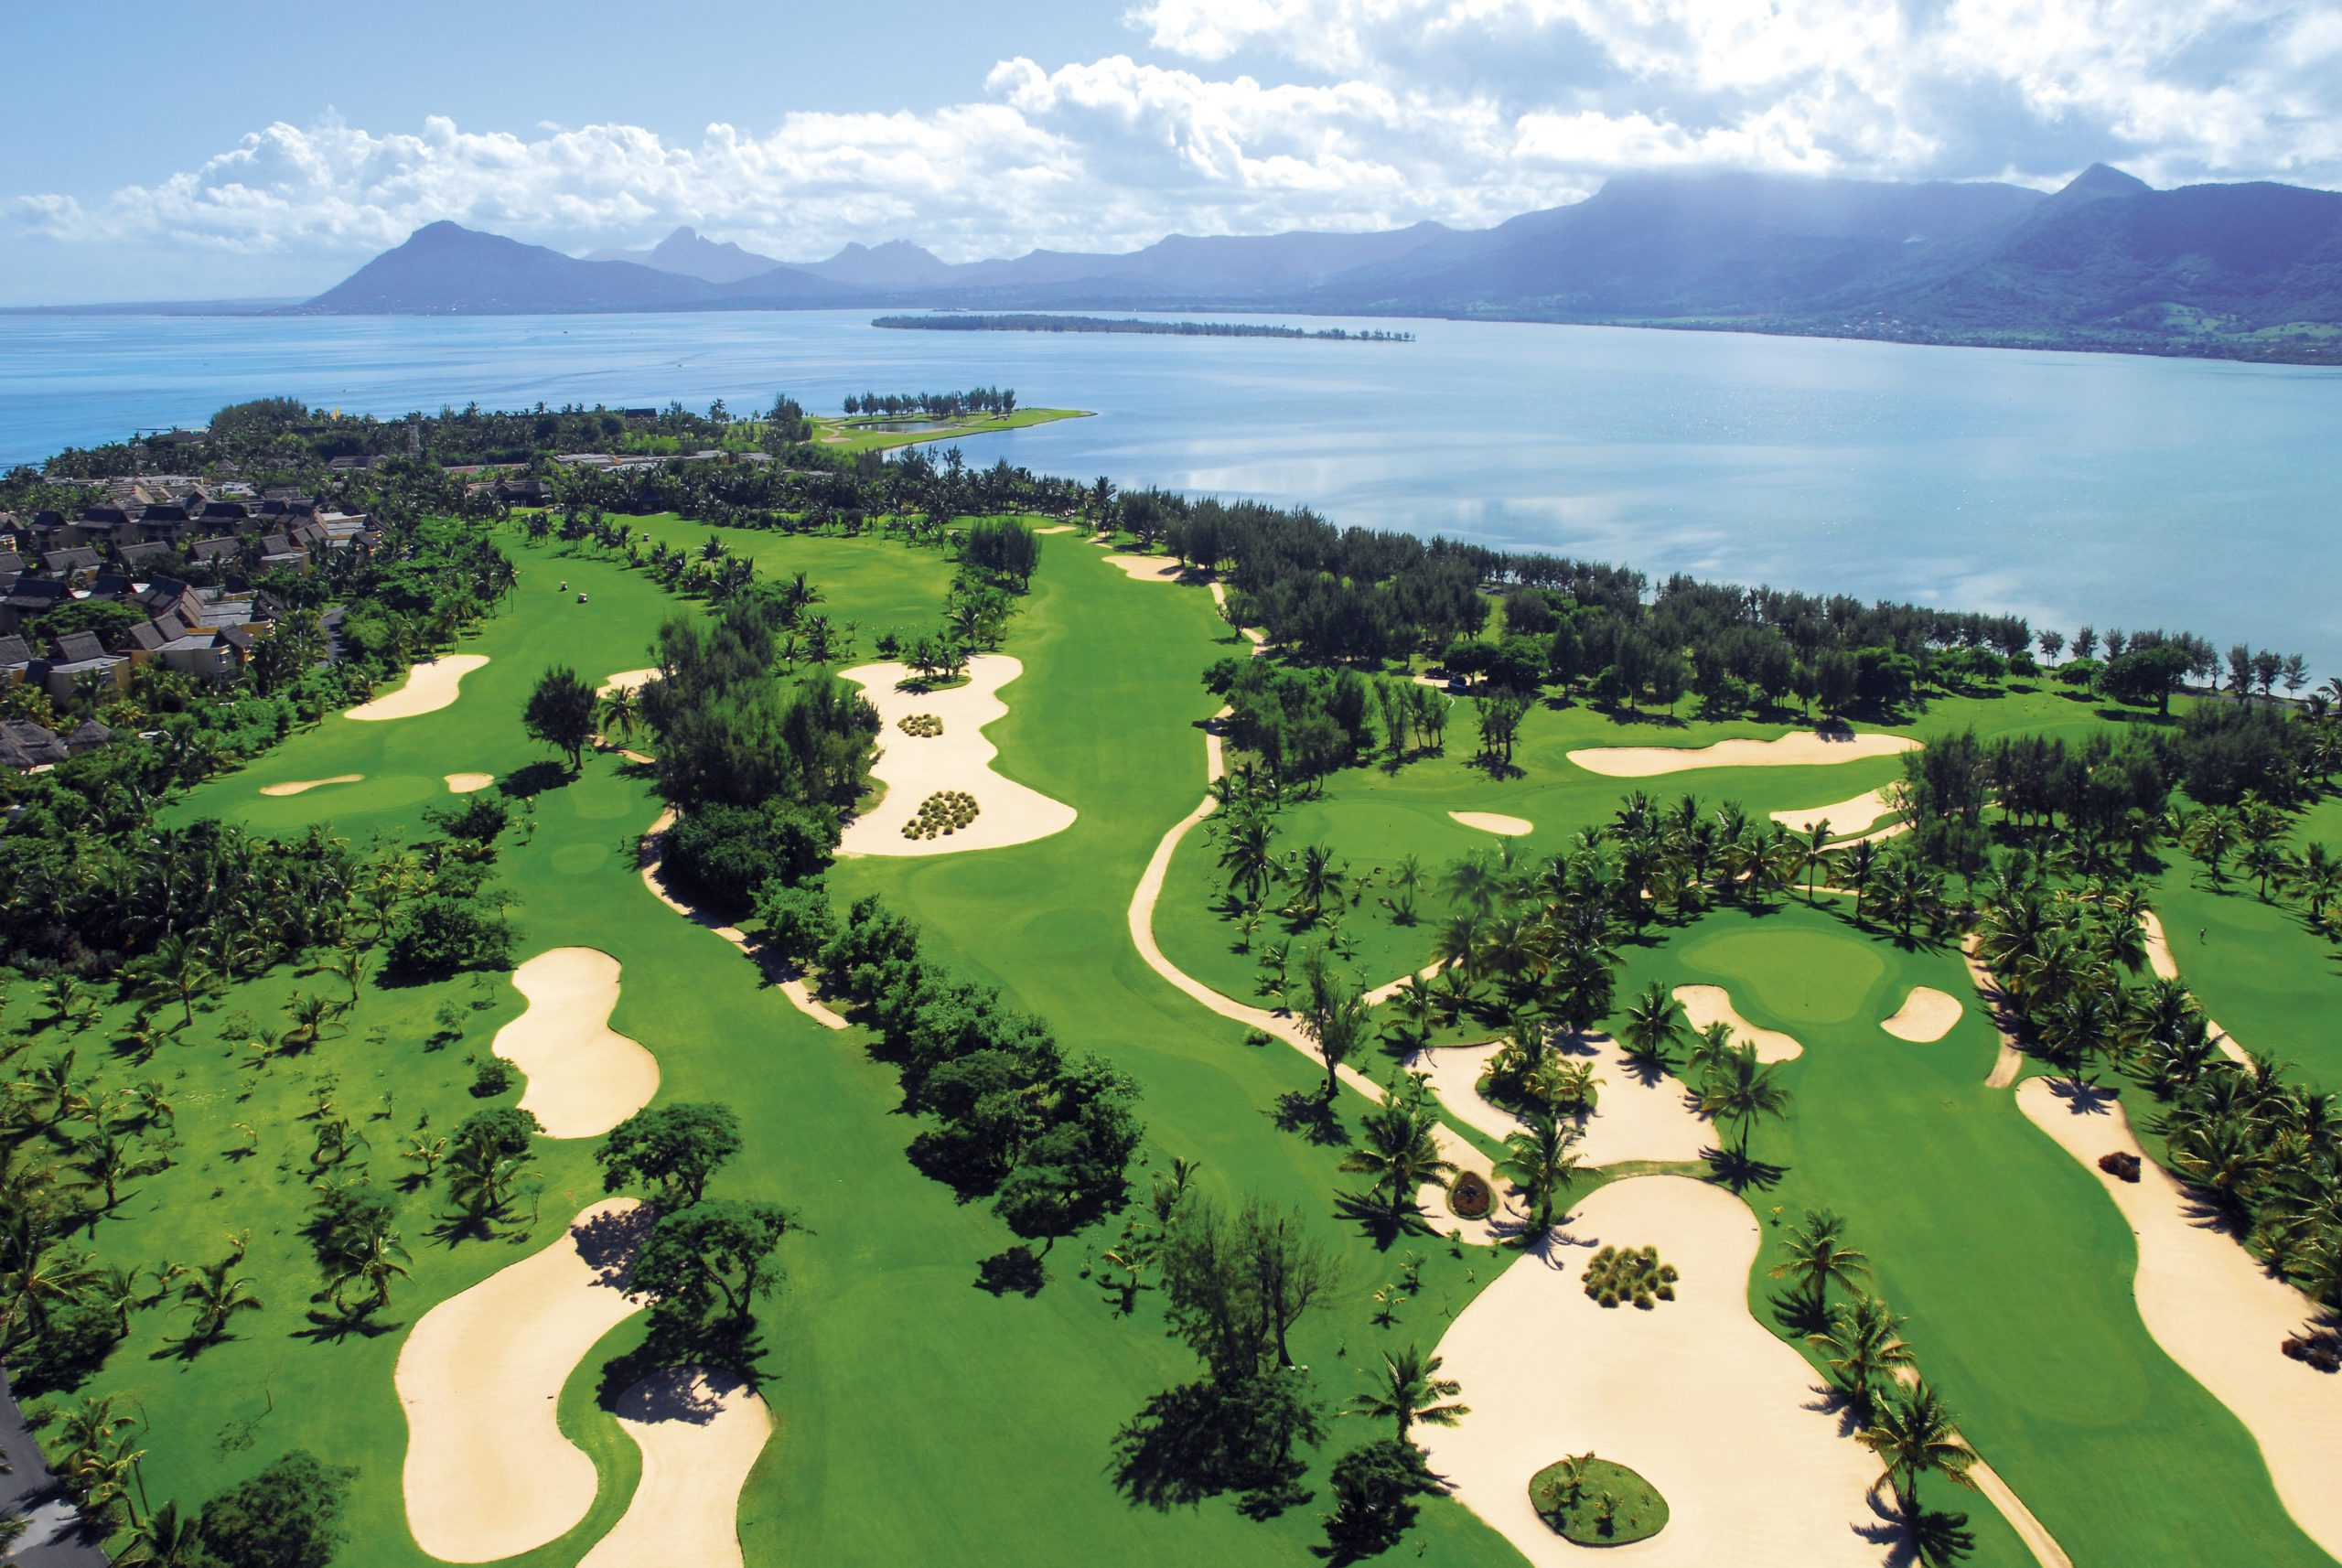 Mauritius golf course